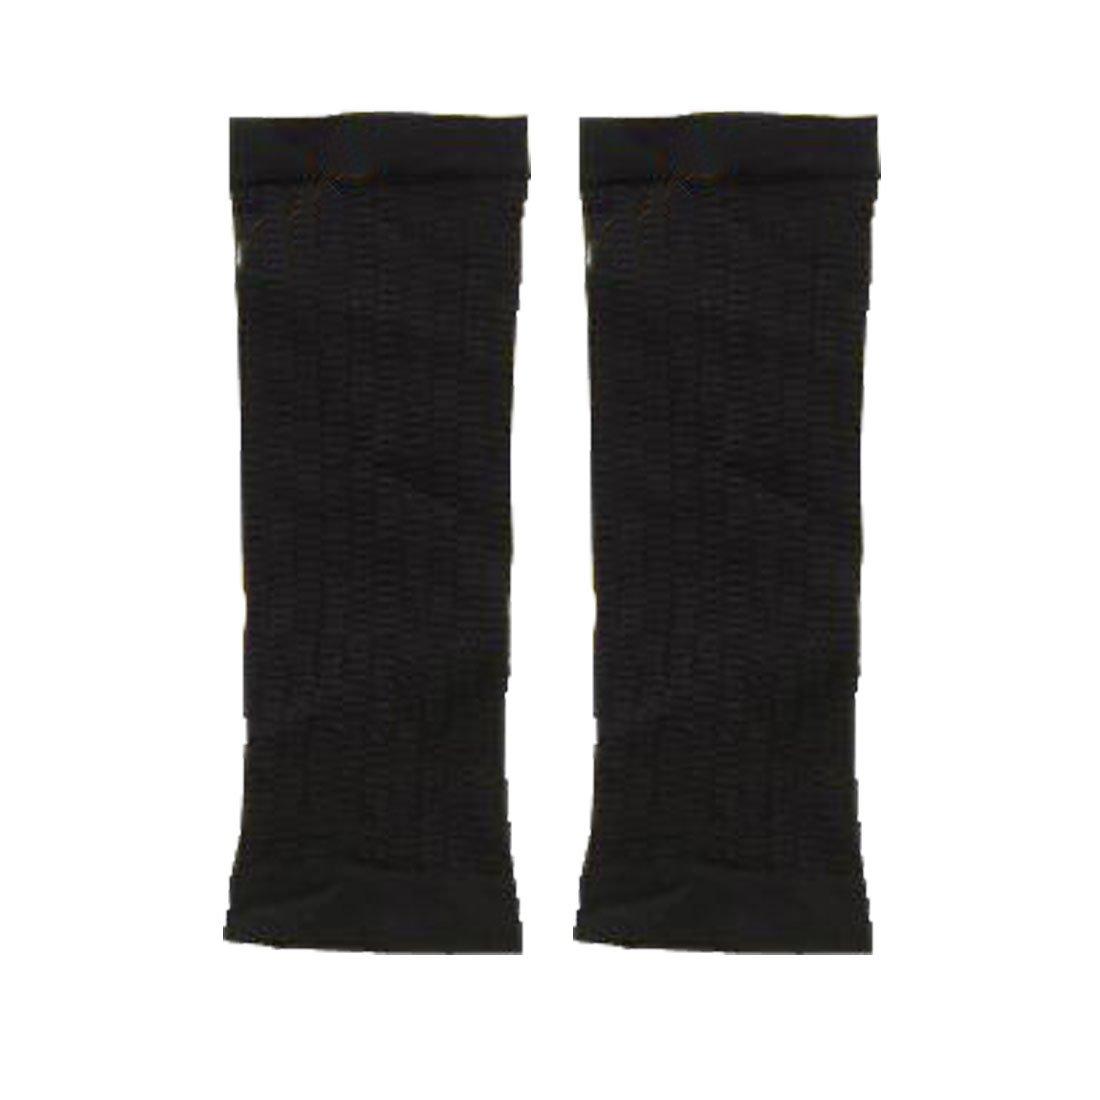 Glield Woman Beauty Slim Weight Loss Elastic Calf Slimming Compression Leg Shaper Sleeve XTW01